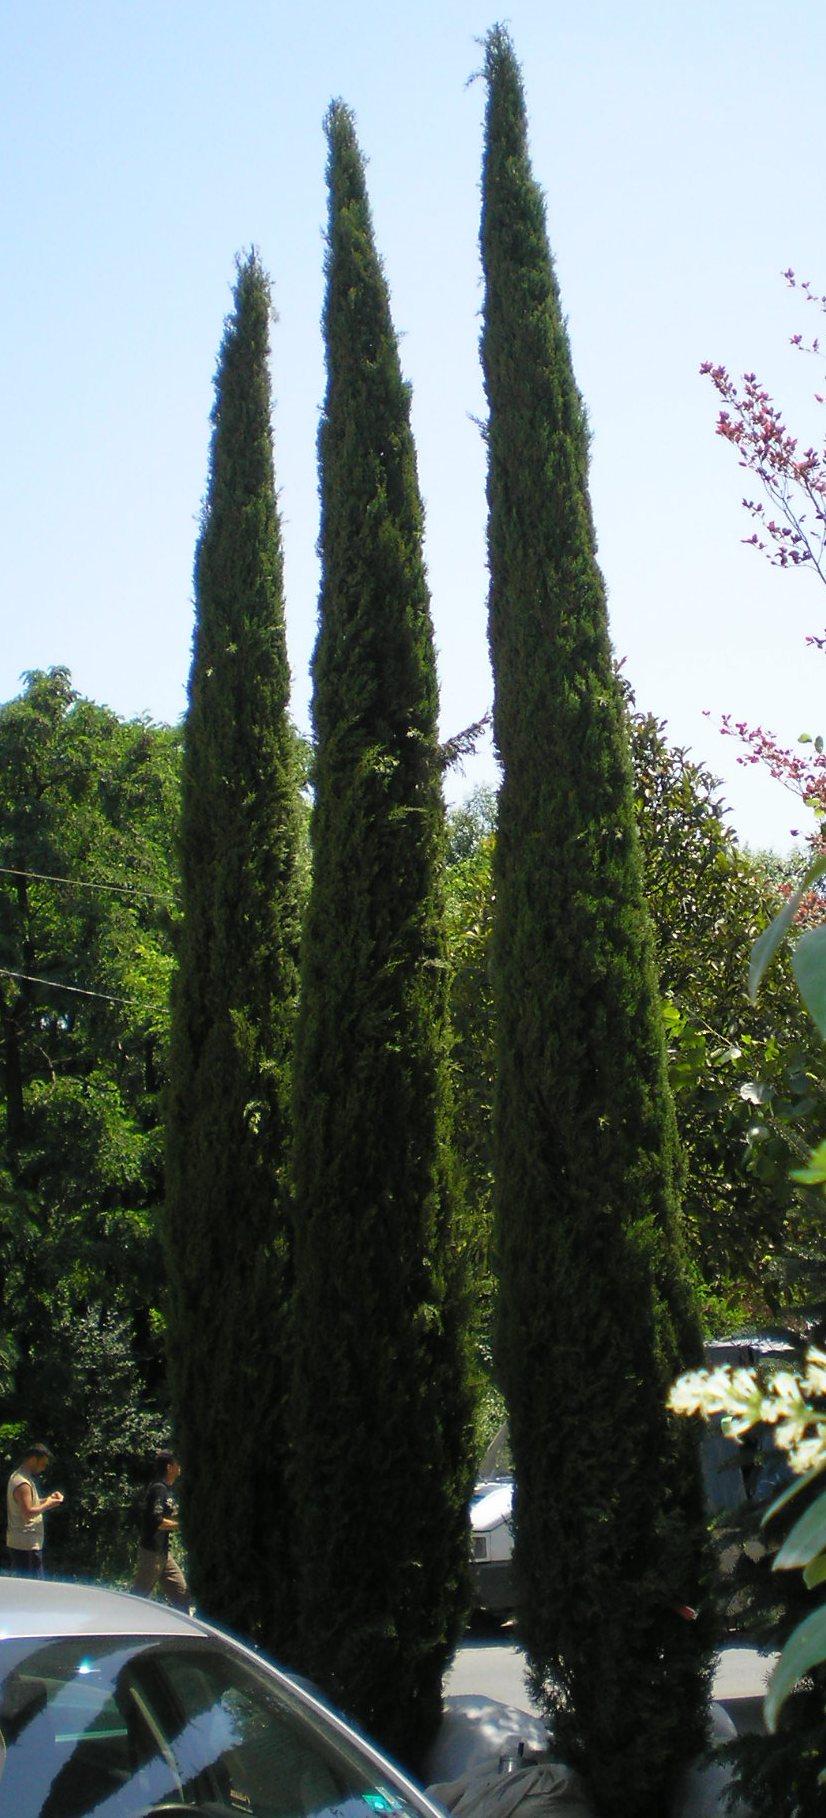 Trees Evergreen Brownswood Nursery